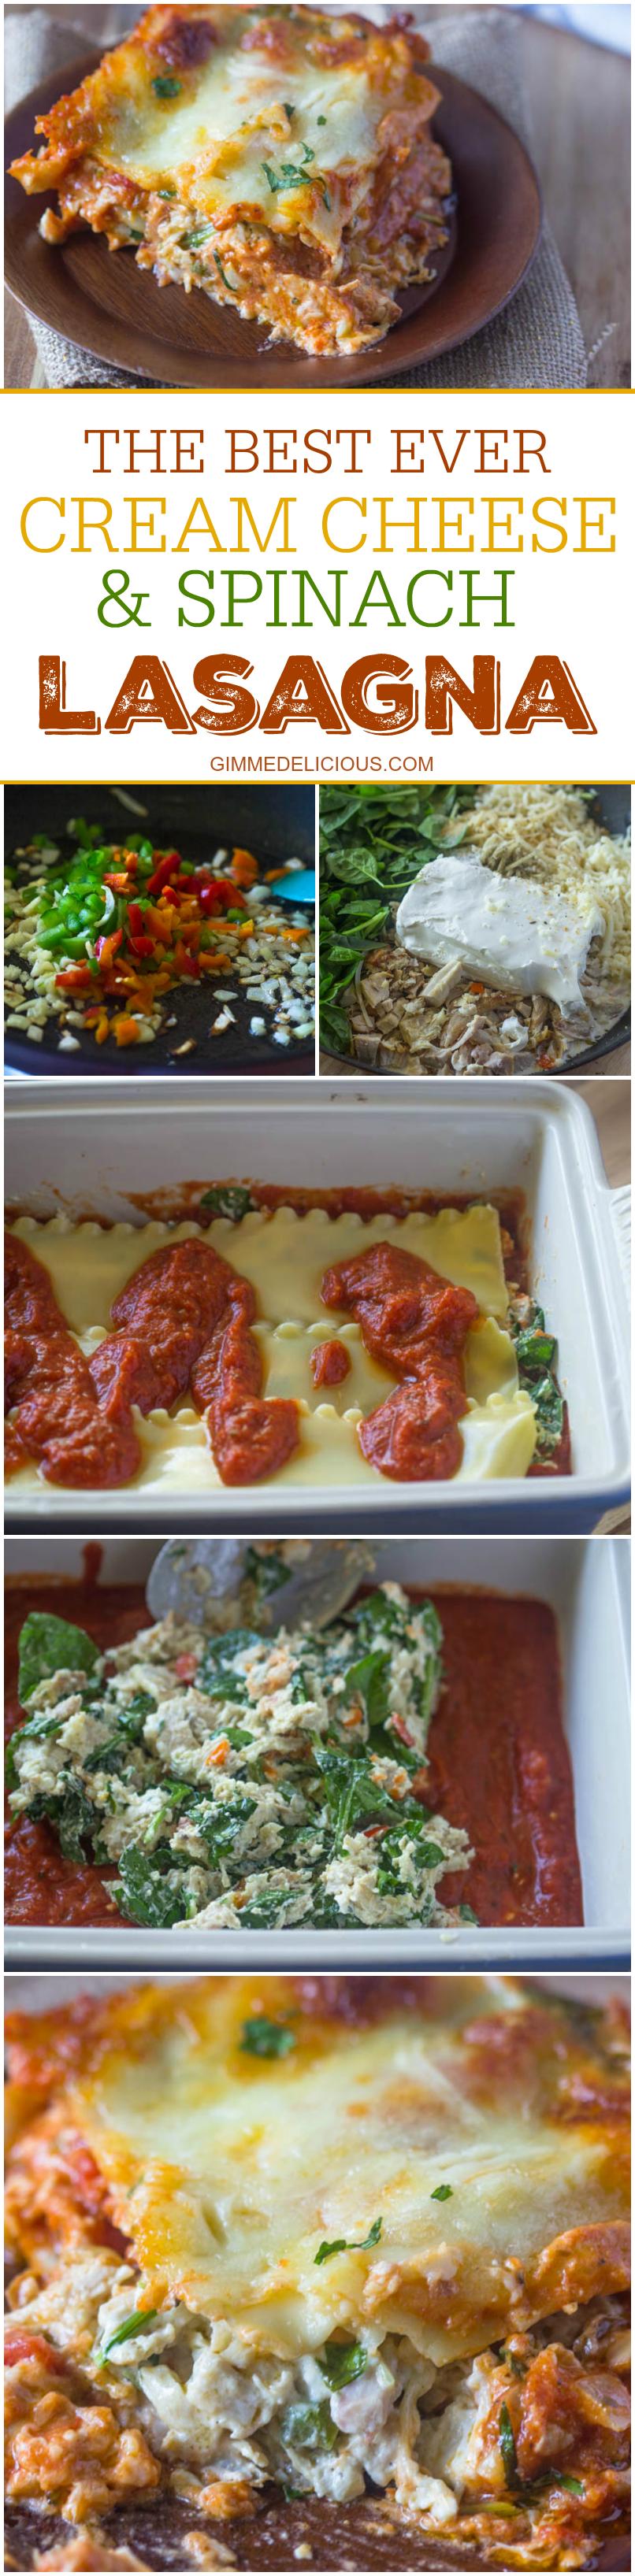 Creamy Chicken, Spinach & Cream Cheese Lasagna #gimmedelicious #leftover